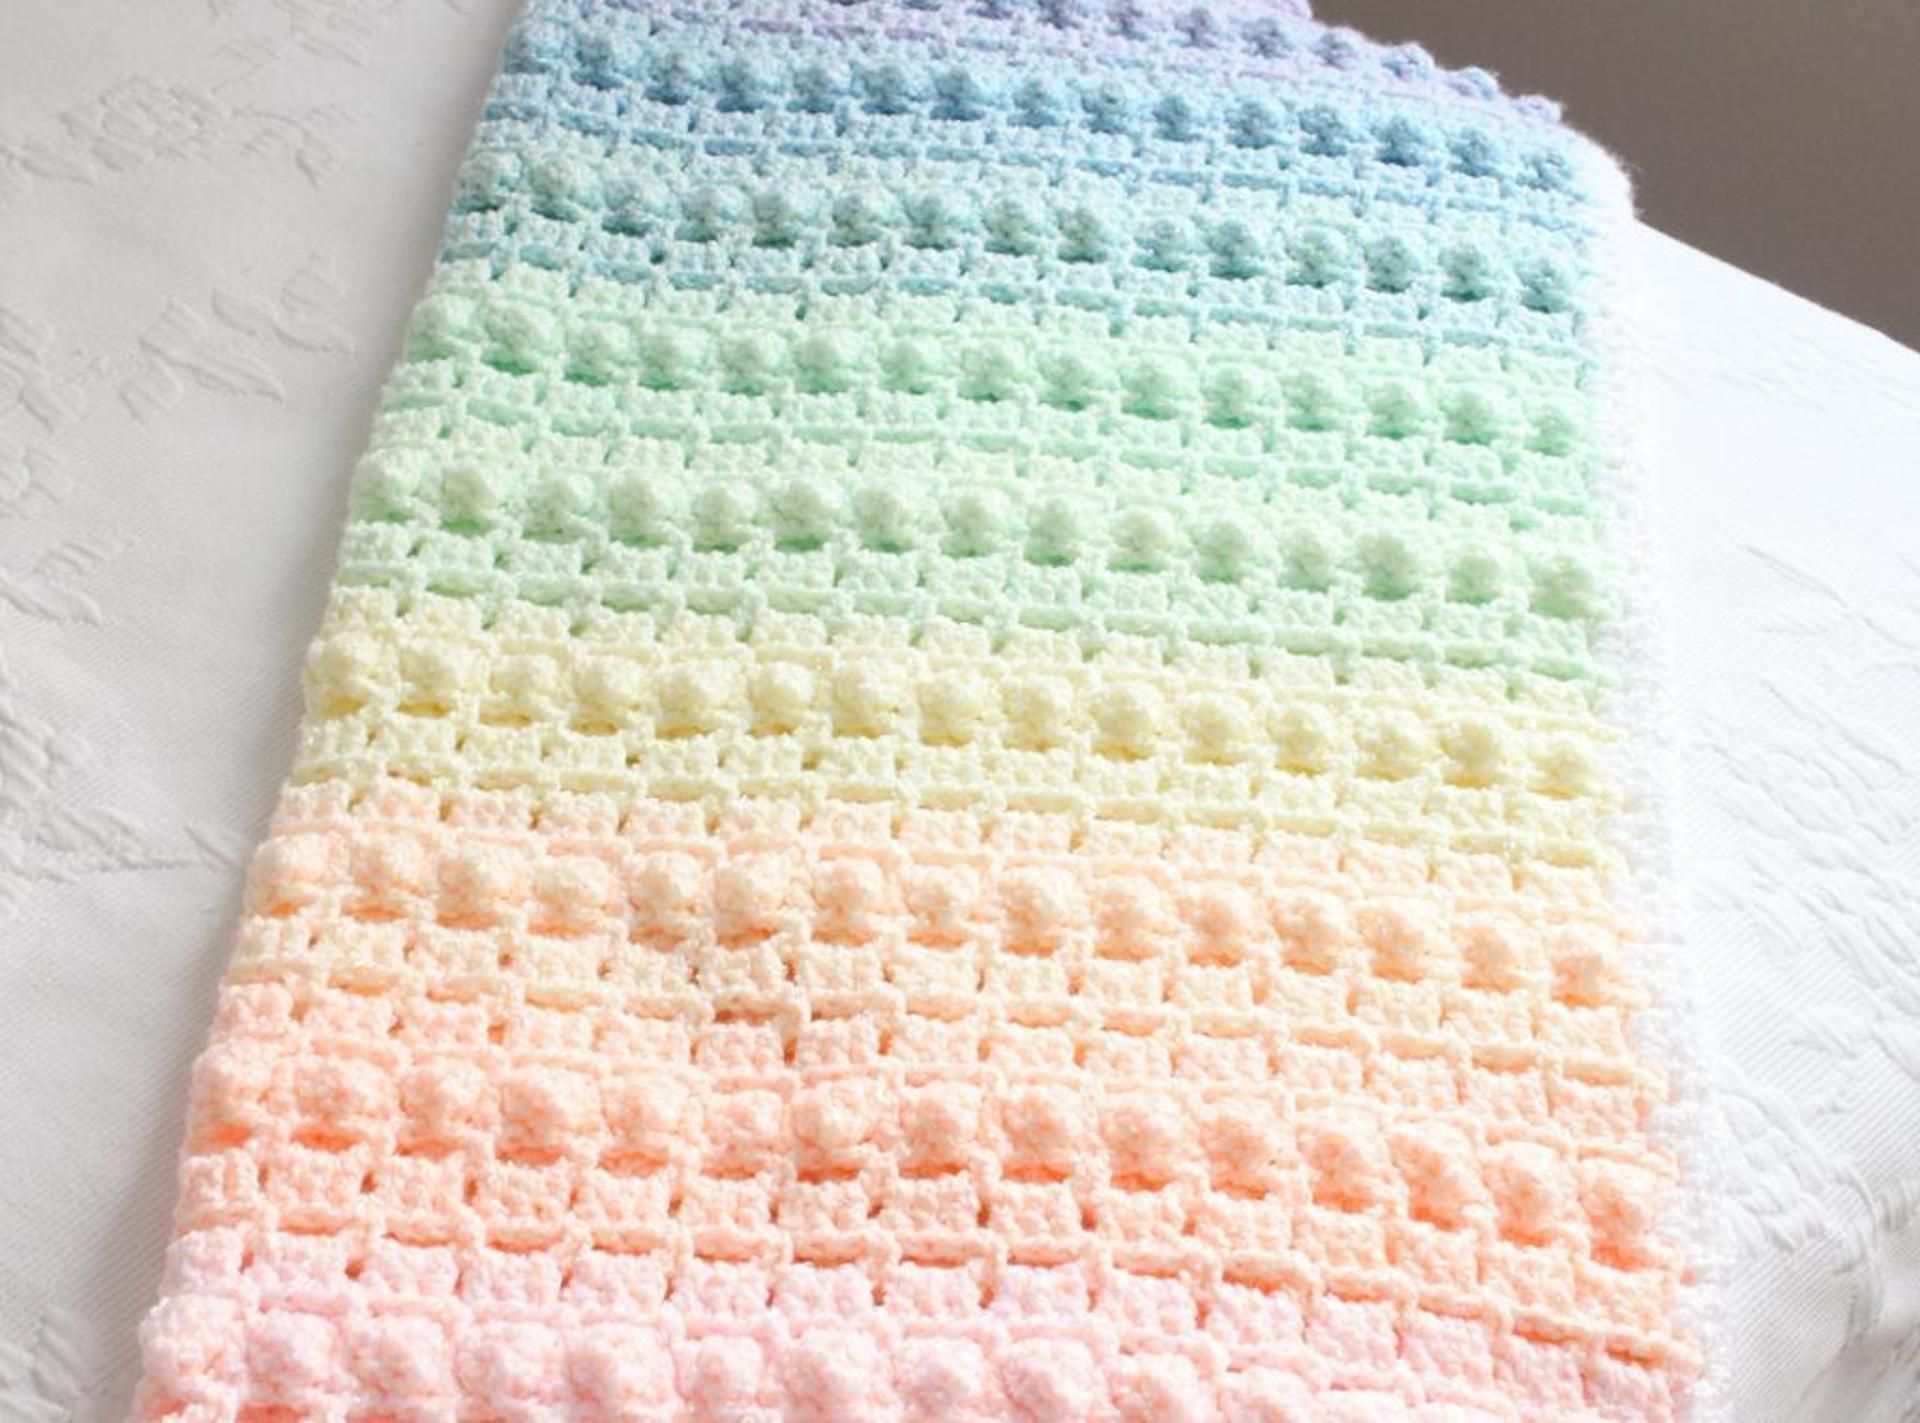 Rainbow popcorn crochet baby blanket crochet baby blankets rainbow popcorn crochet baby blanket bankloansurffo Choice Image